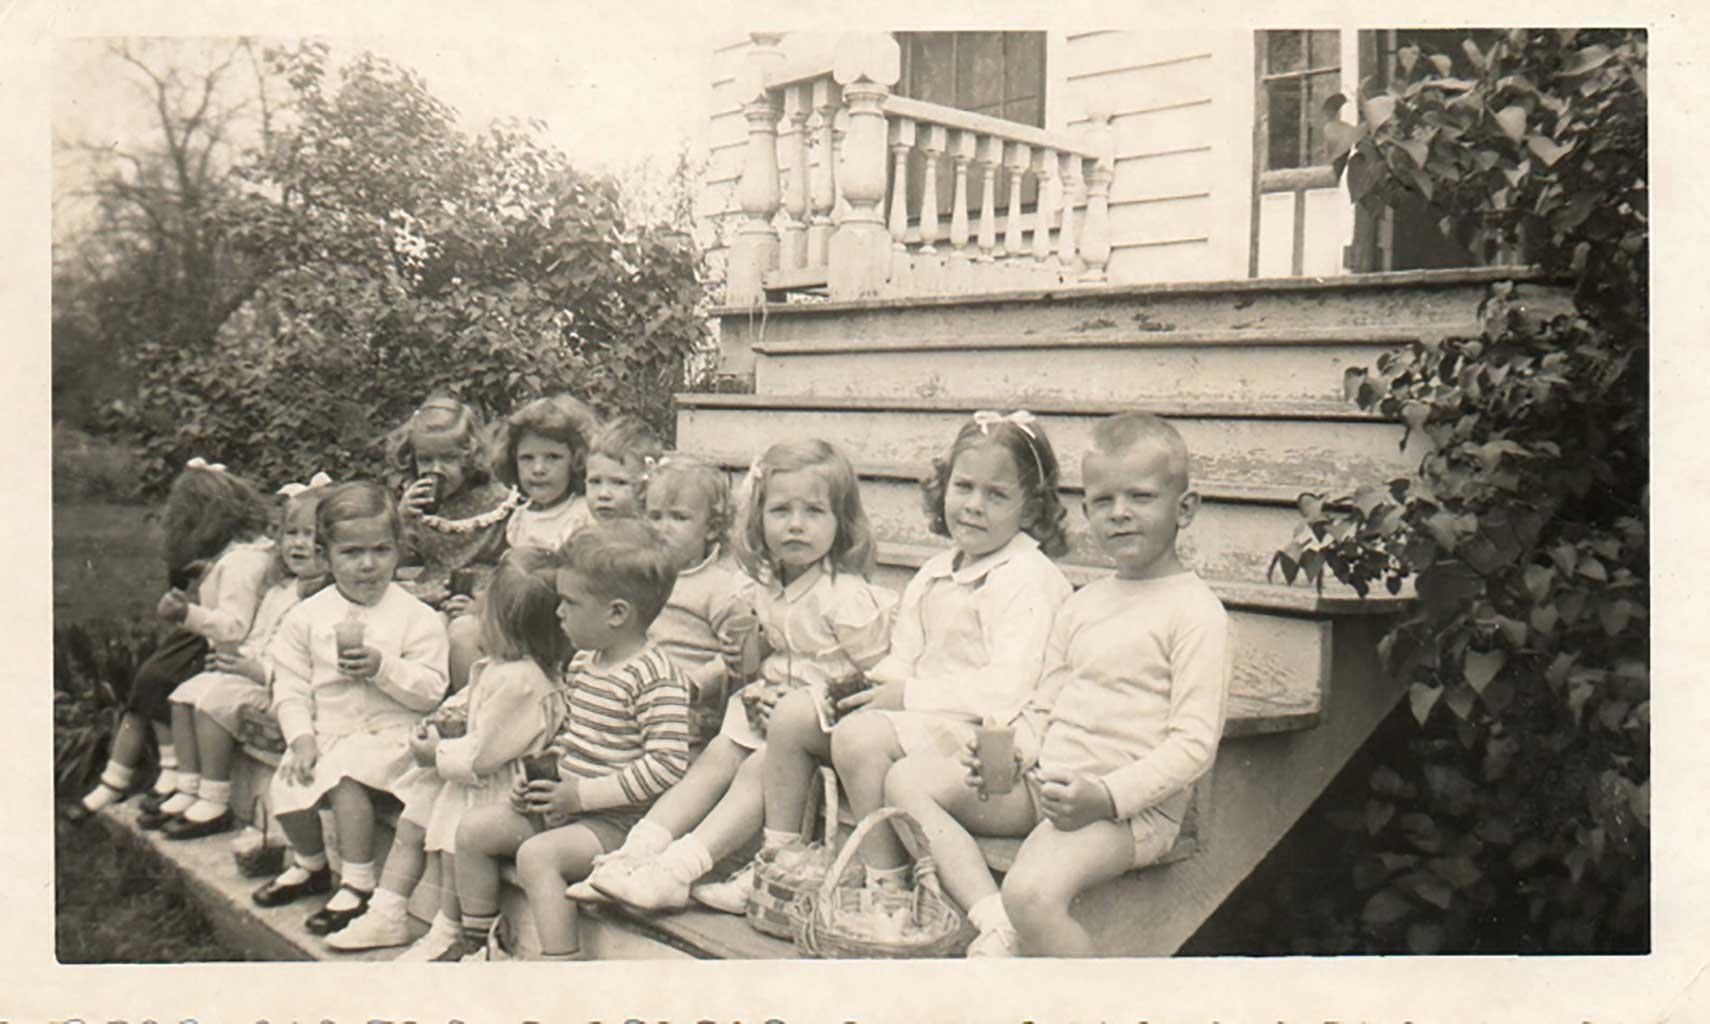 chuckatuck-kids-circa-1953-54-img868